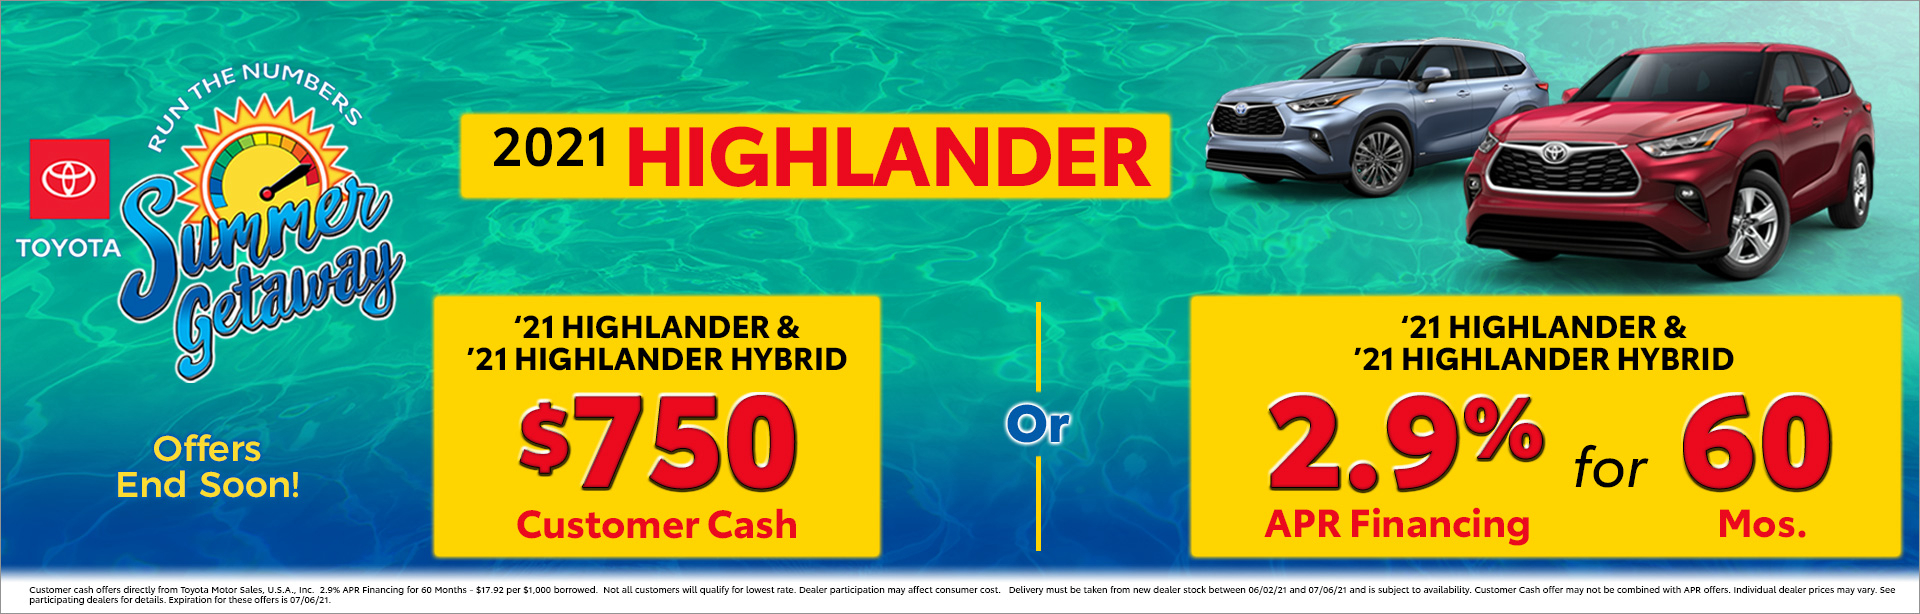 06-21_01_Cincinnati-June-2021-CIN-Summer-Getaway-Highlander_1920x614_ed42_Highlander-Hybrid-Highlander_O_xta.jpeg